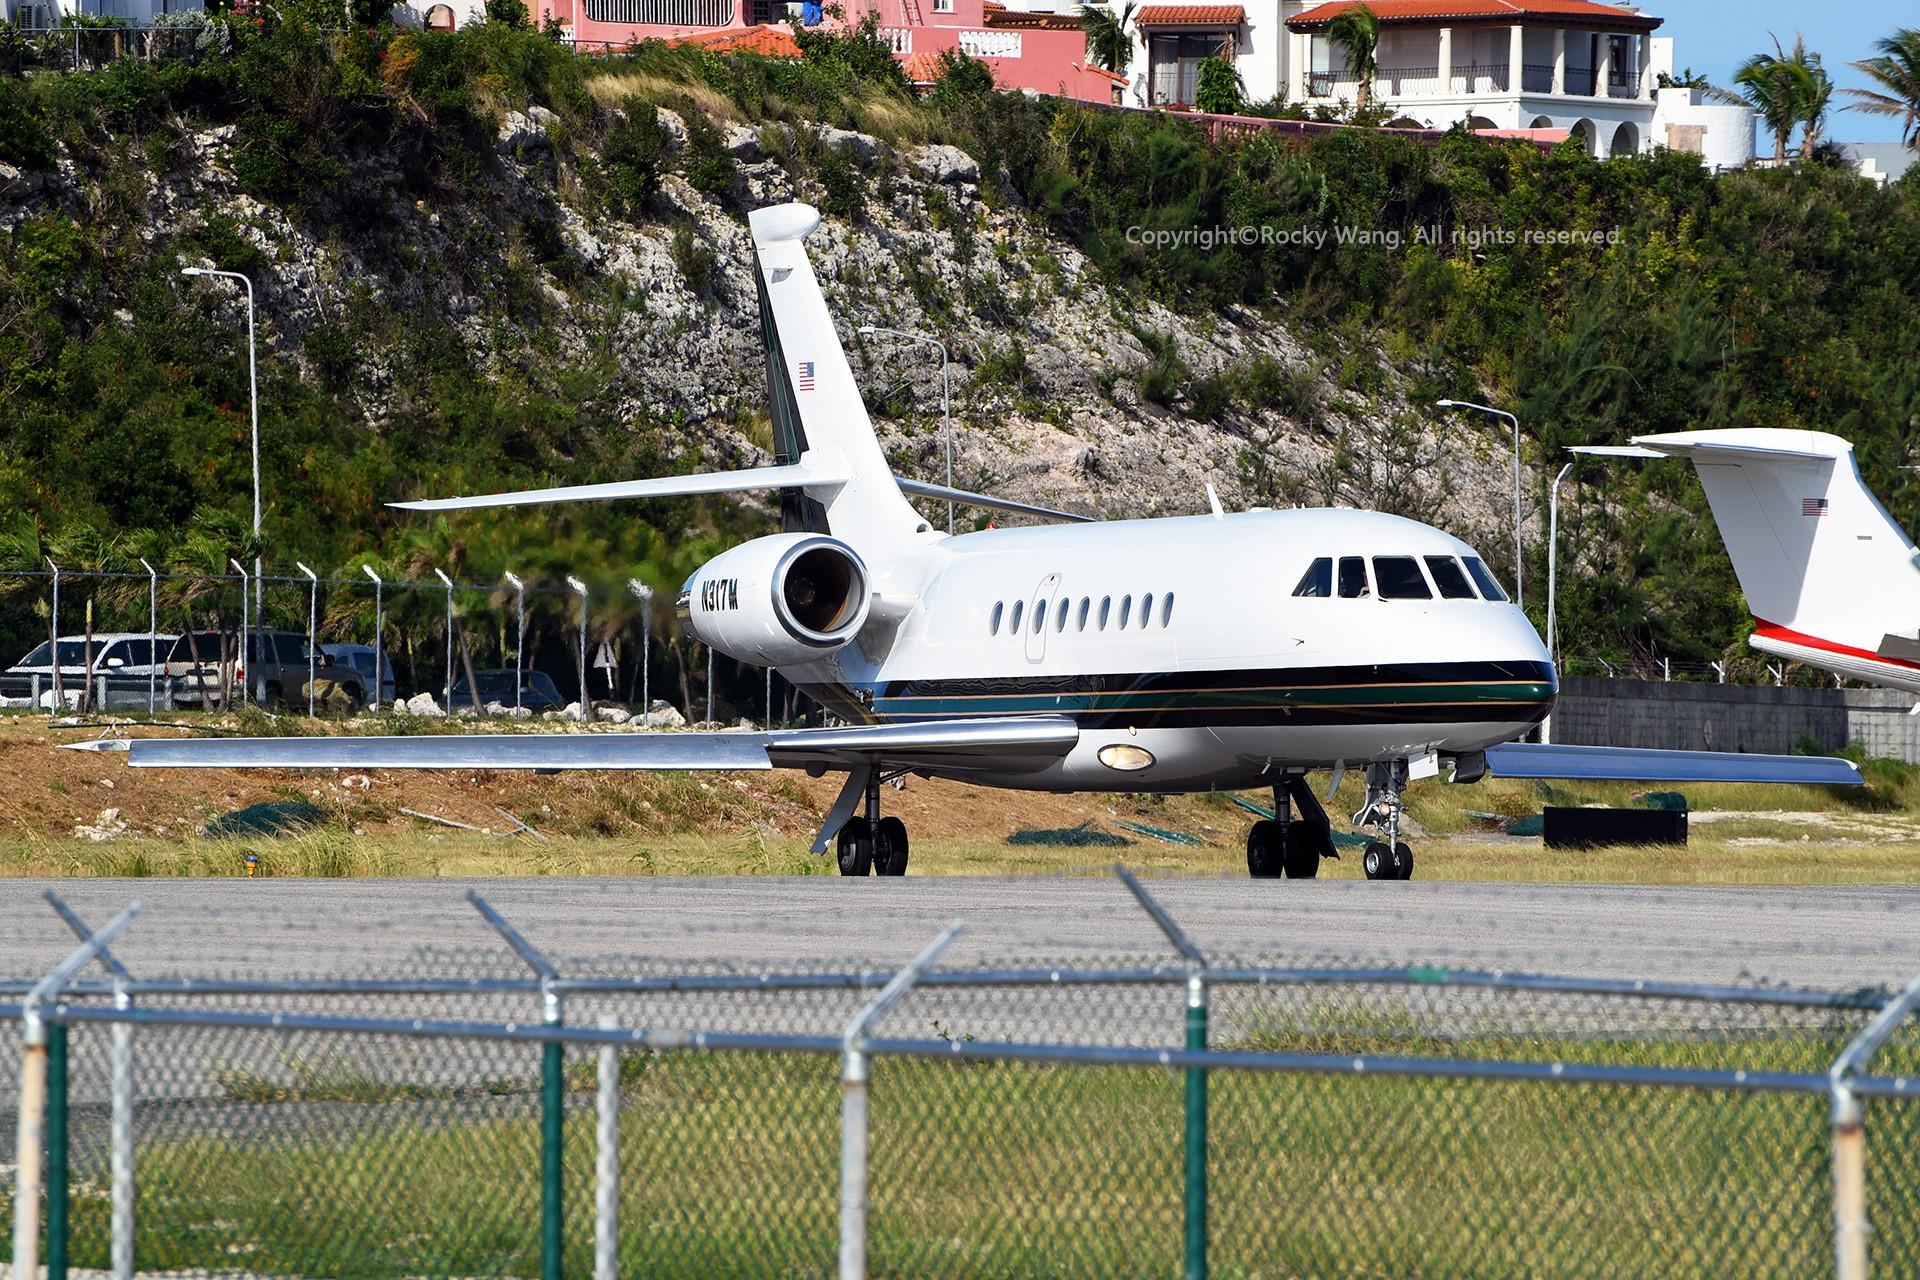 Re:[原创]My endless Caribbean dream——圣马丁朱莉安娜公主机场拍机记 DASSAULT FALCON 2000 N317M 荷属安的列斯群岛朱利安娜公主机场